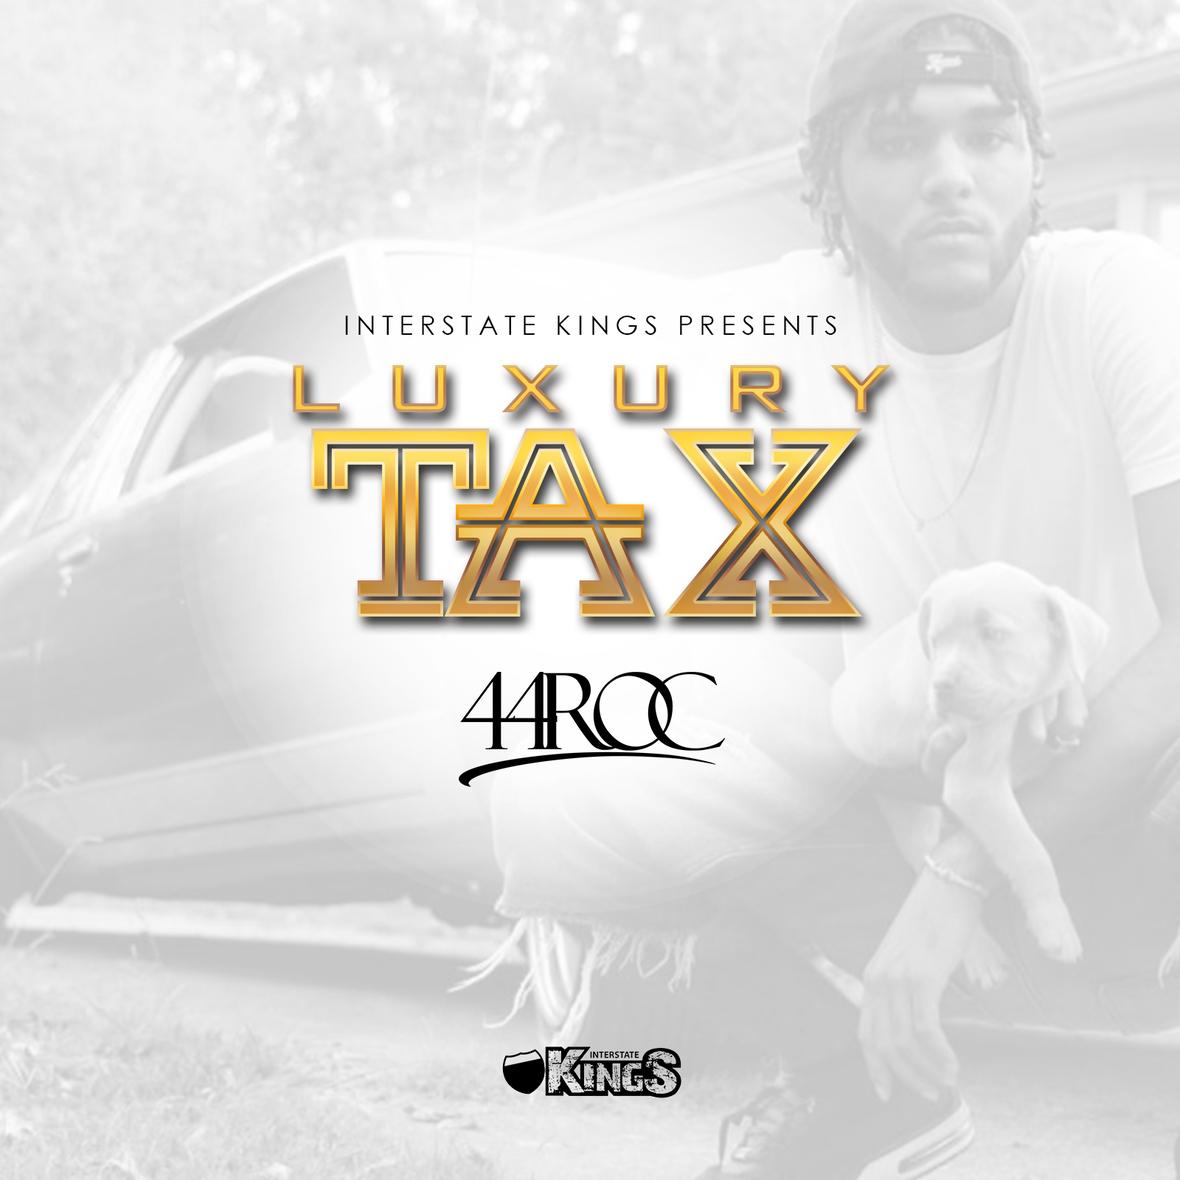 44Roc - Luxury Tax FINAL iTunes no PA